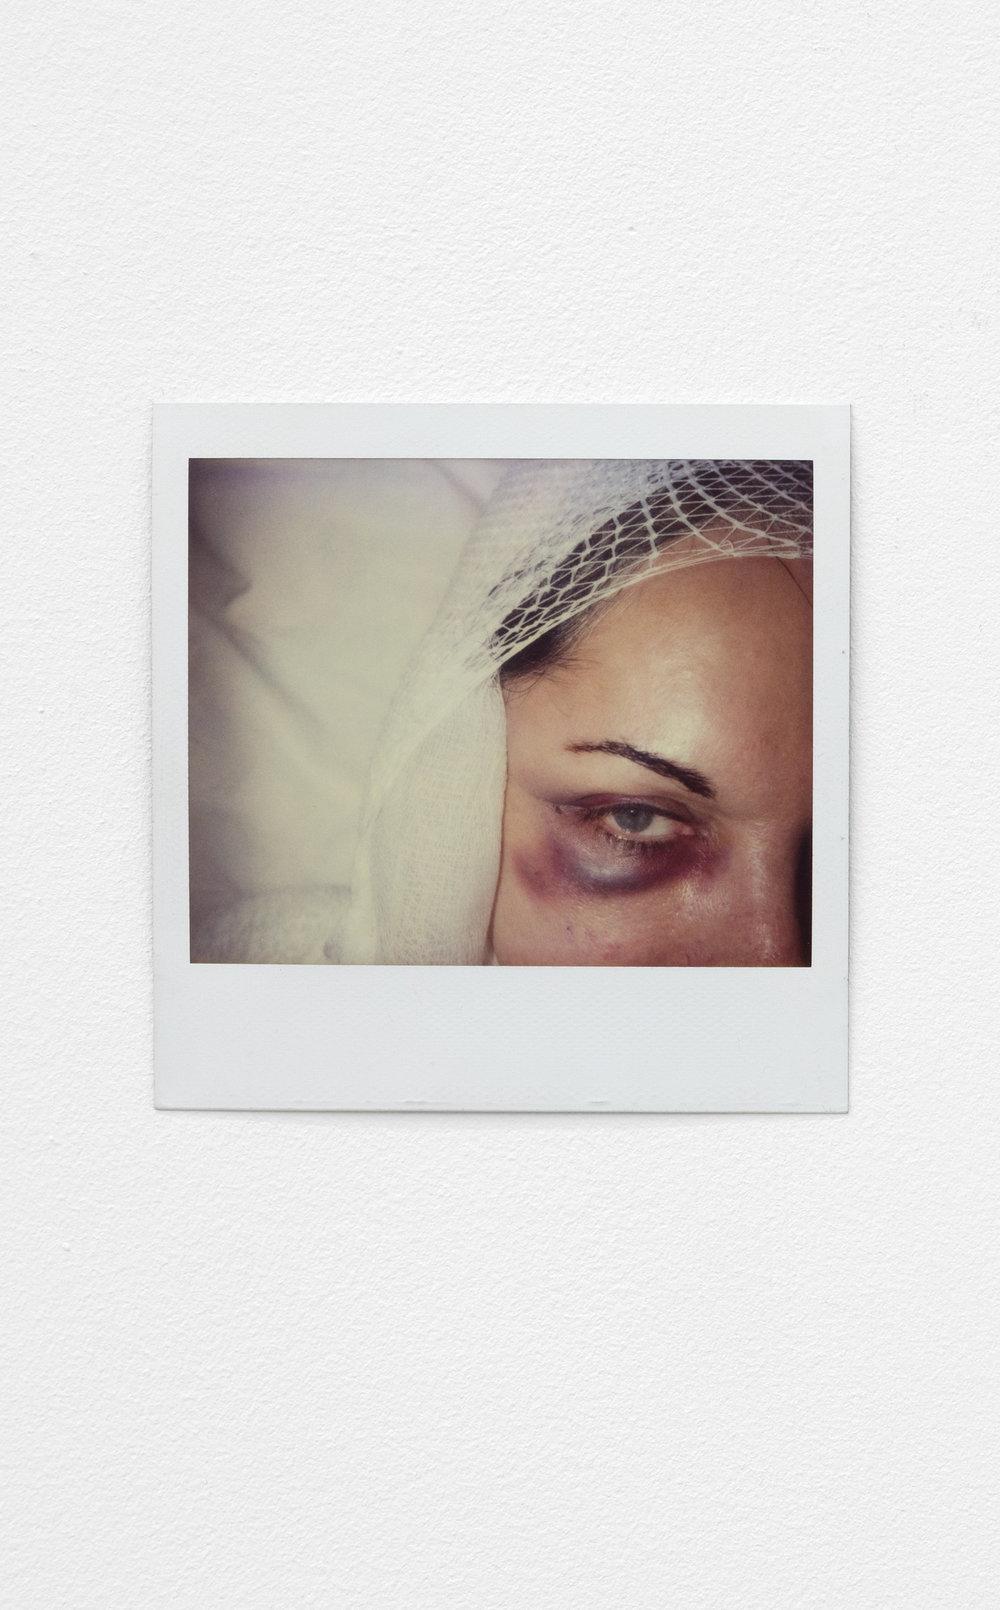 Genesis BREYER P-ORRIDGE,  Untitled , 2004 Polaroid, 4 x 4 in